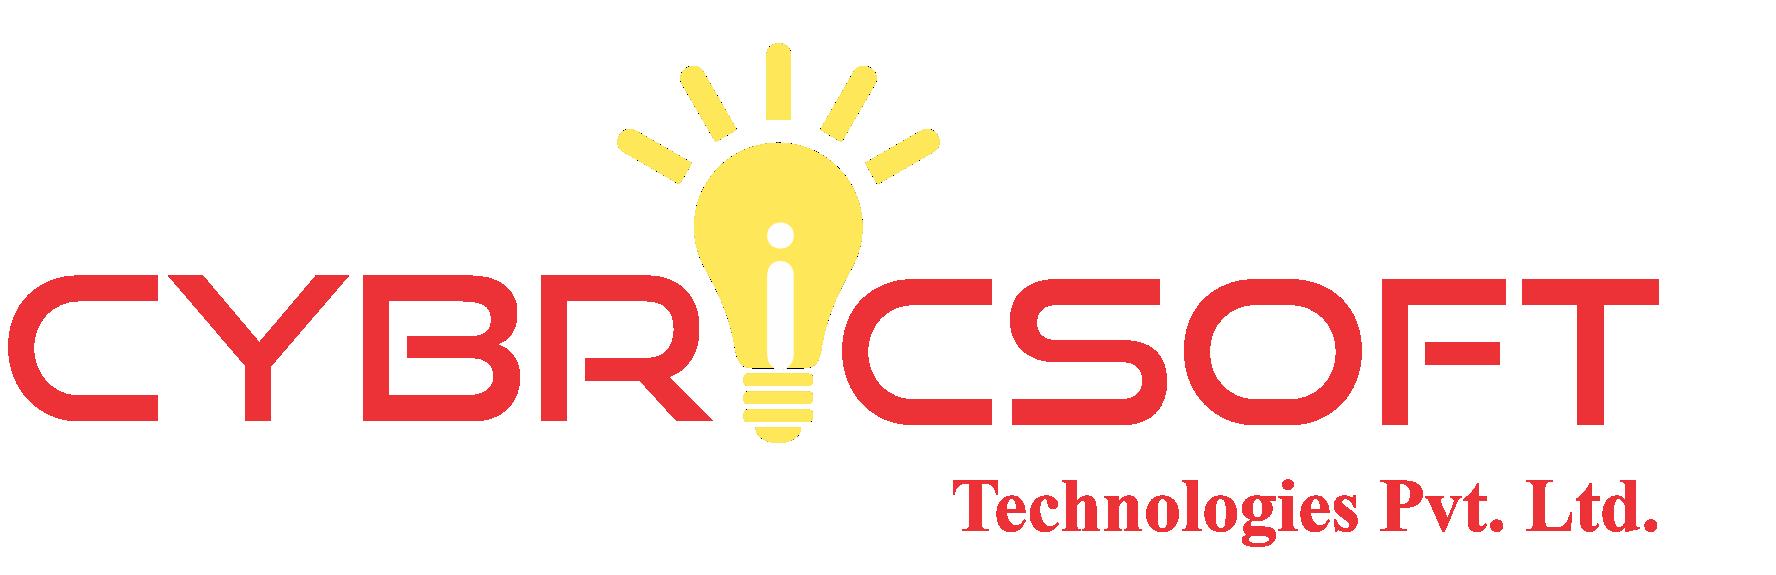 Cybricsoft Technologies